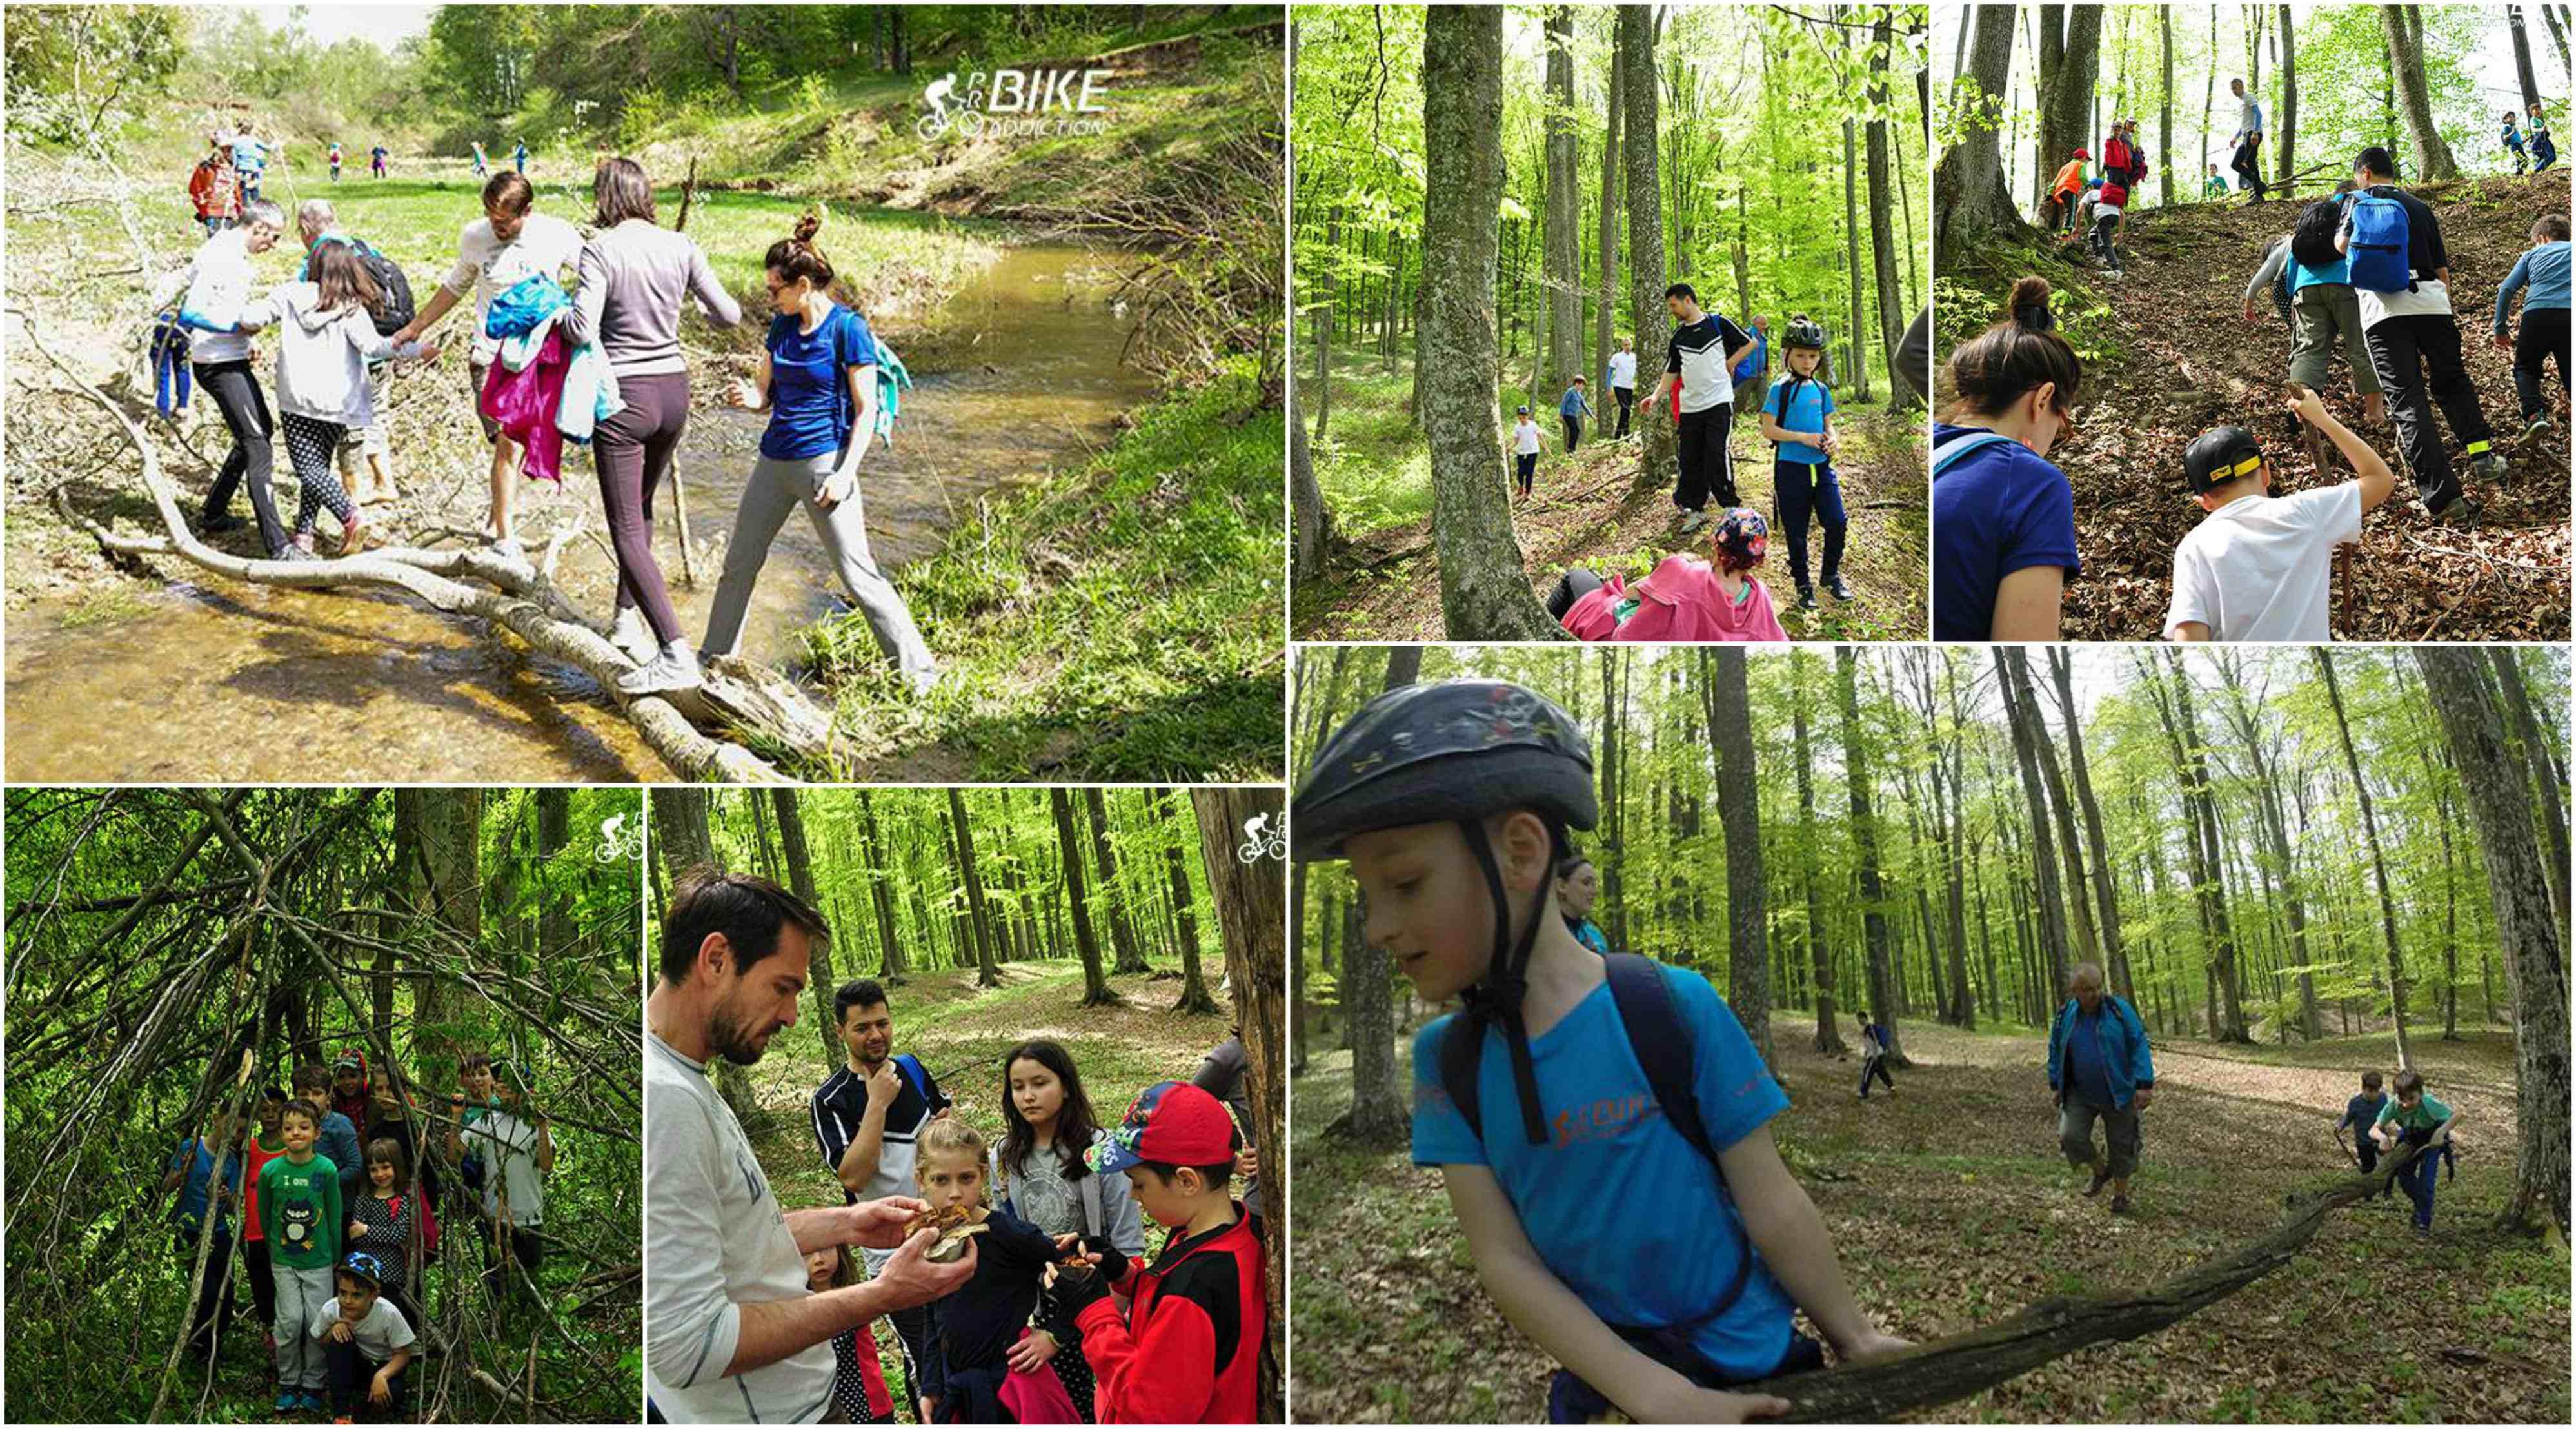 probikeaddiction padurea dobrovat cicloturism